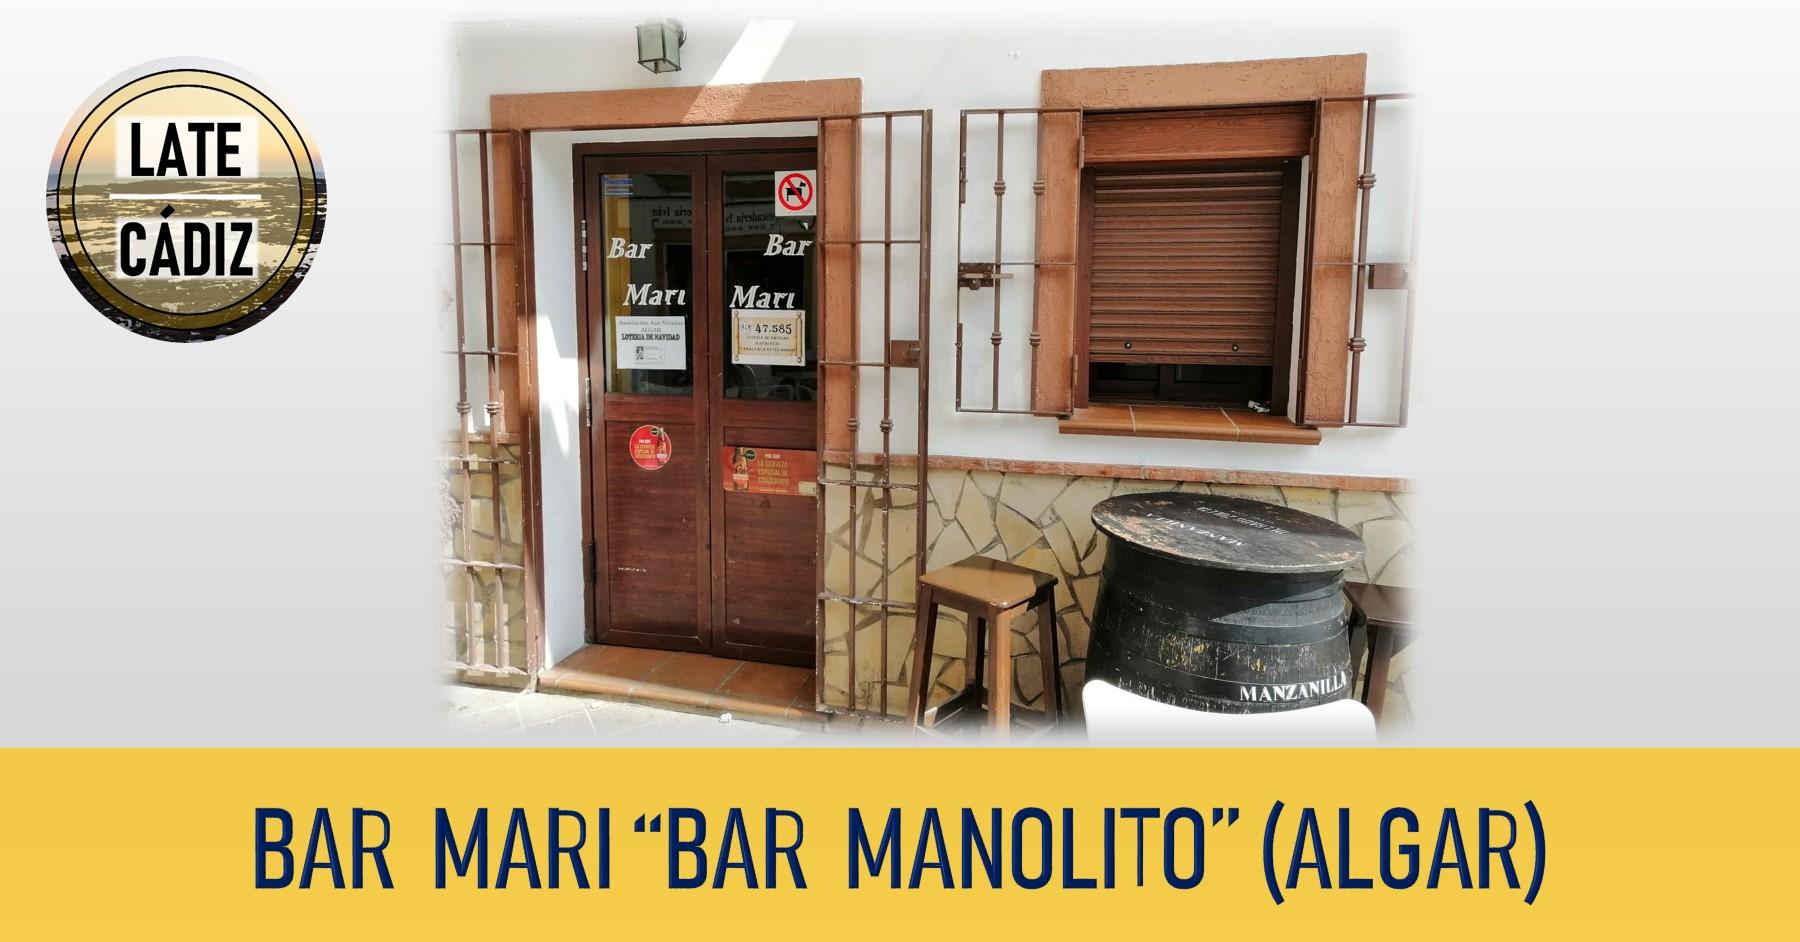 bar mari bar manolito algar 0